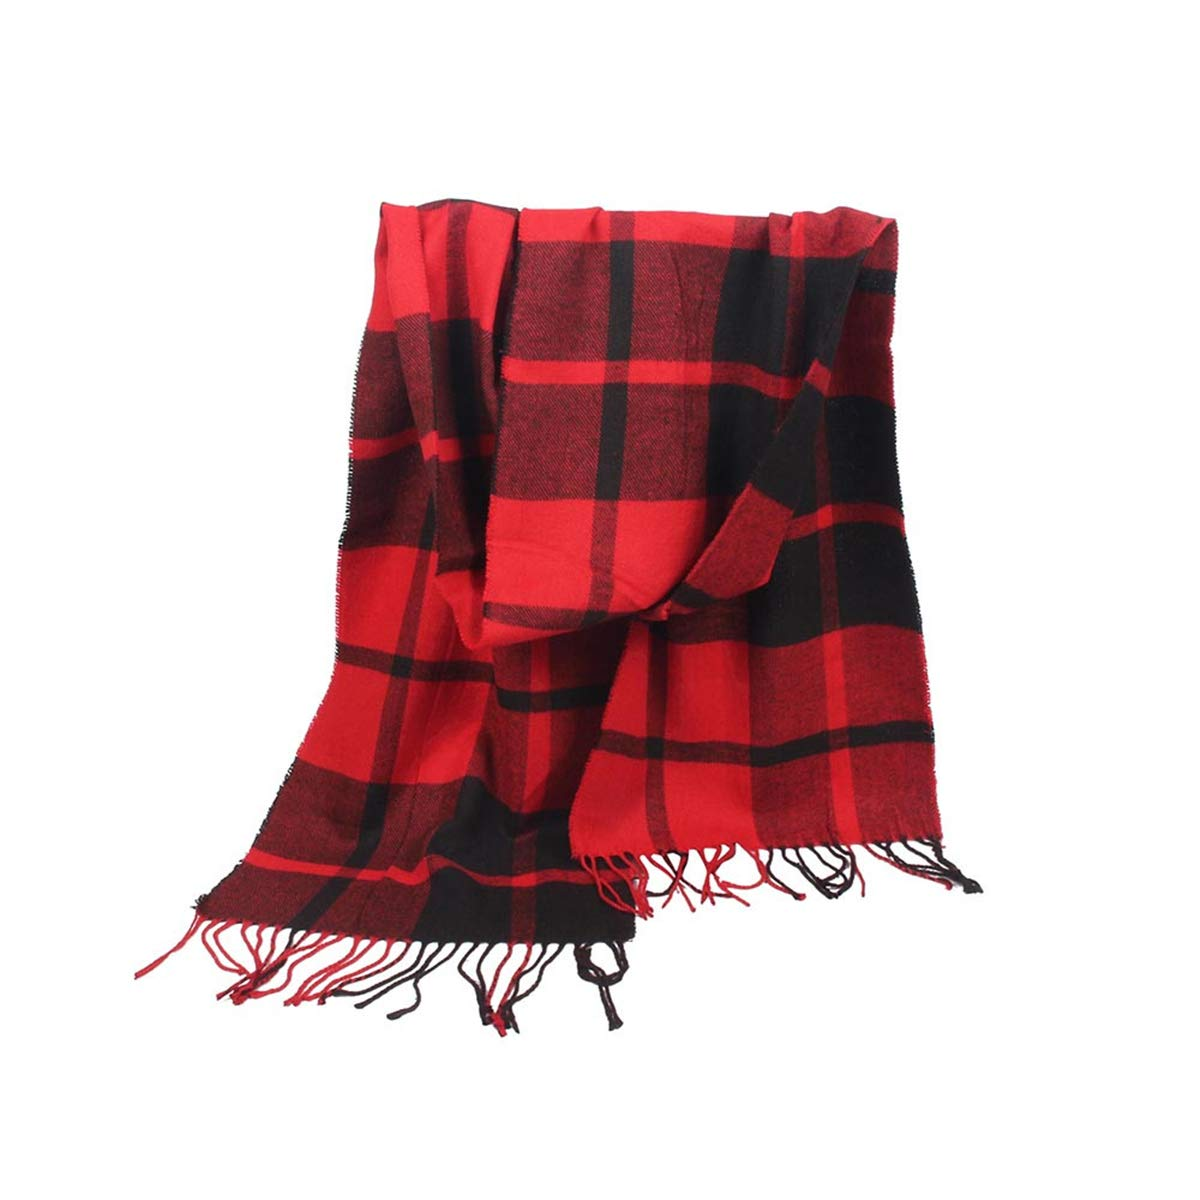 Rosennie Women Scarf, Womens Autumn Winter Fashion Warm Soft Tassels Shawl Striped Imitation Cashmere Rectangle Scarf Air Conditioner Shawl